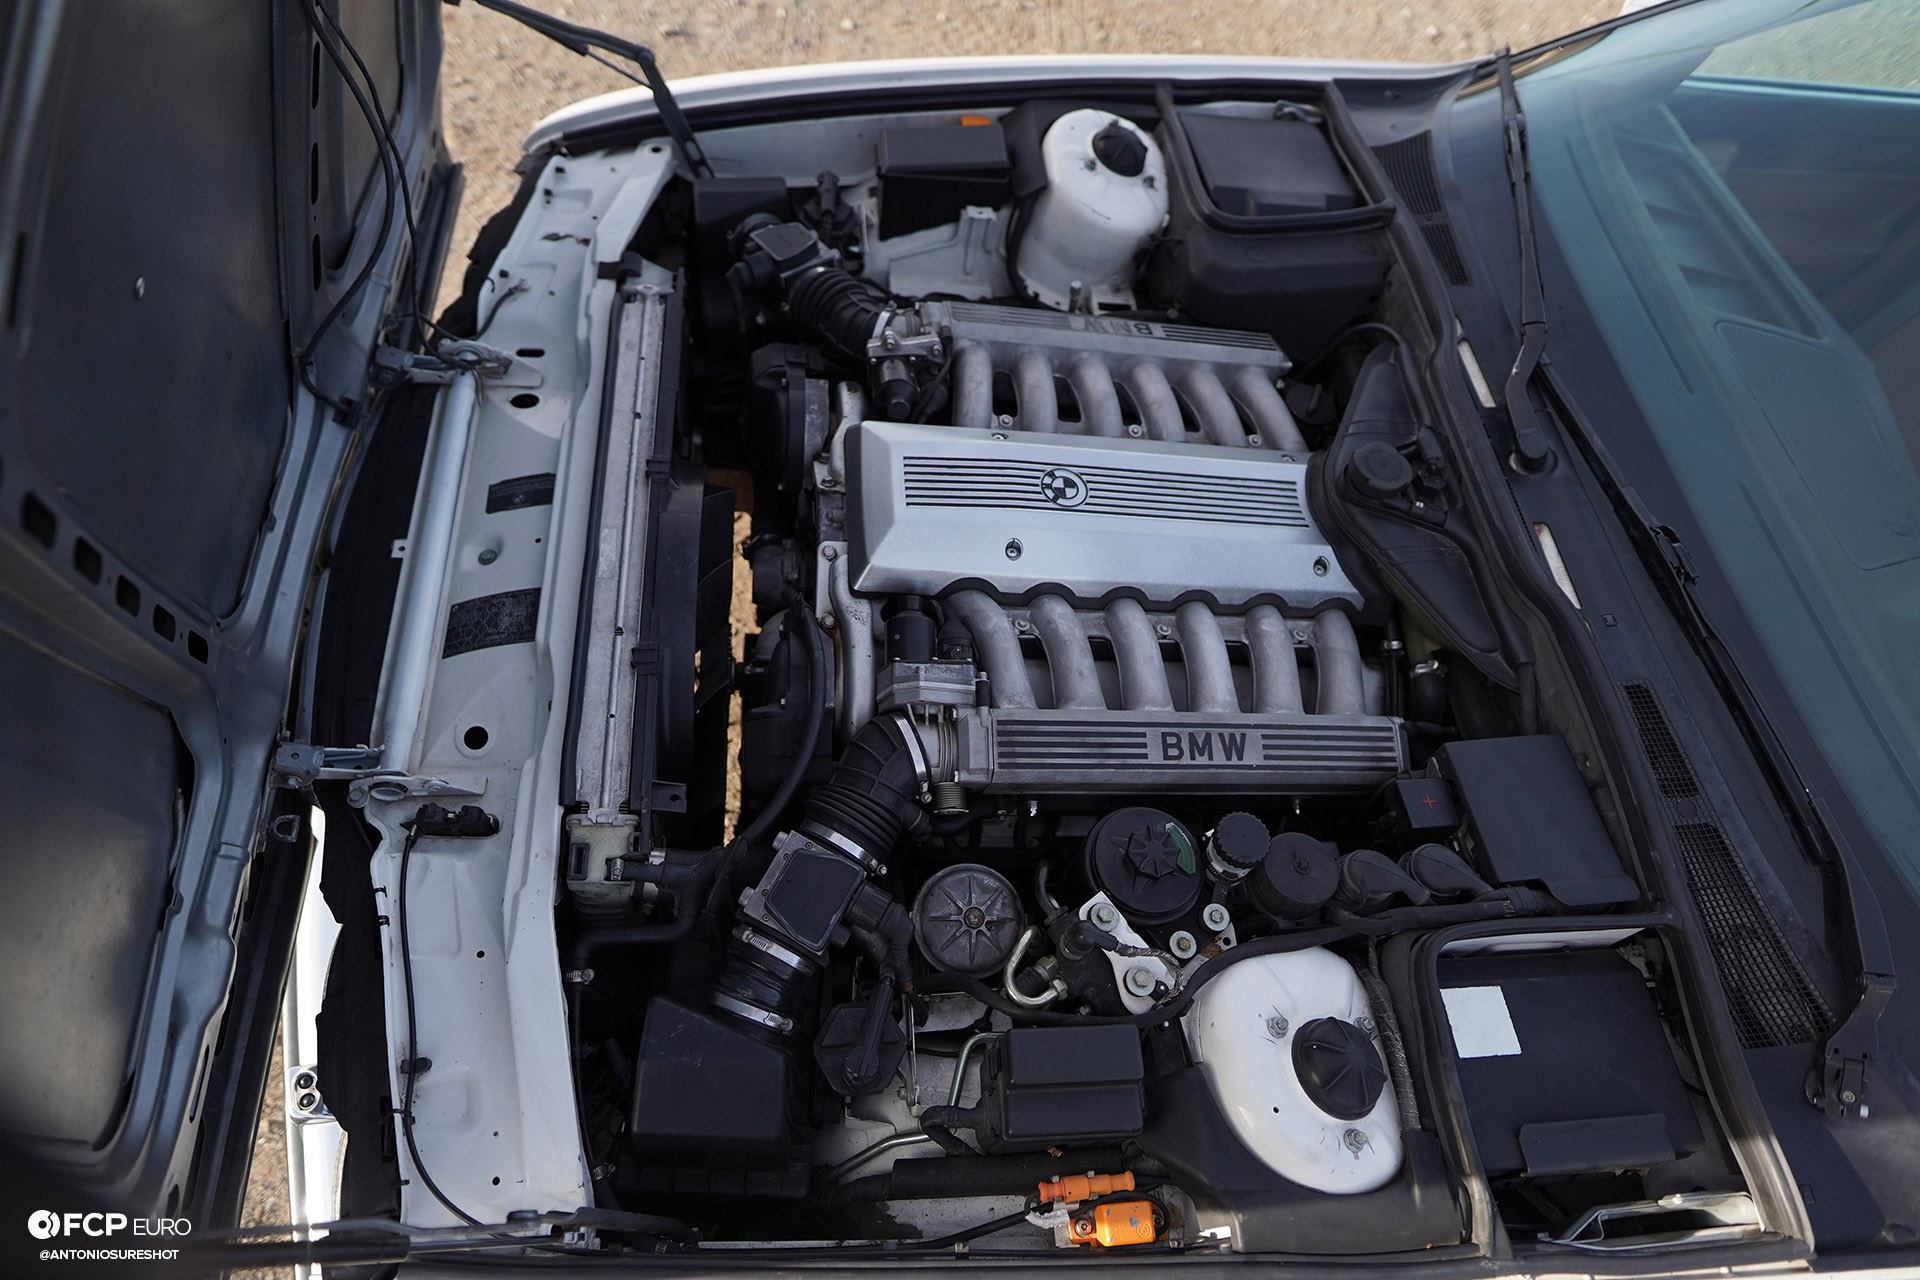 BMW E32 750iL 6 speed A9A02540